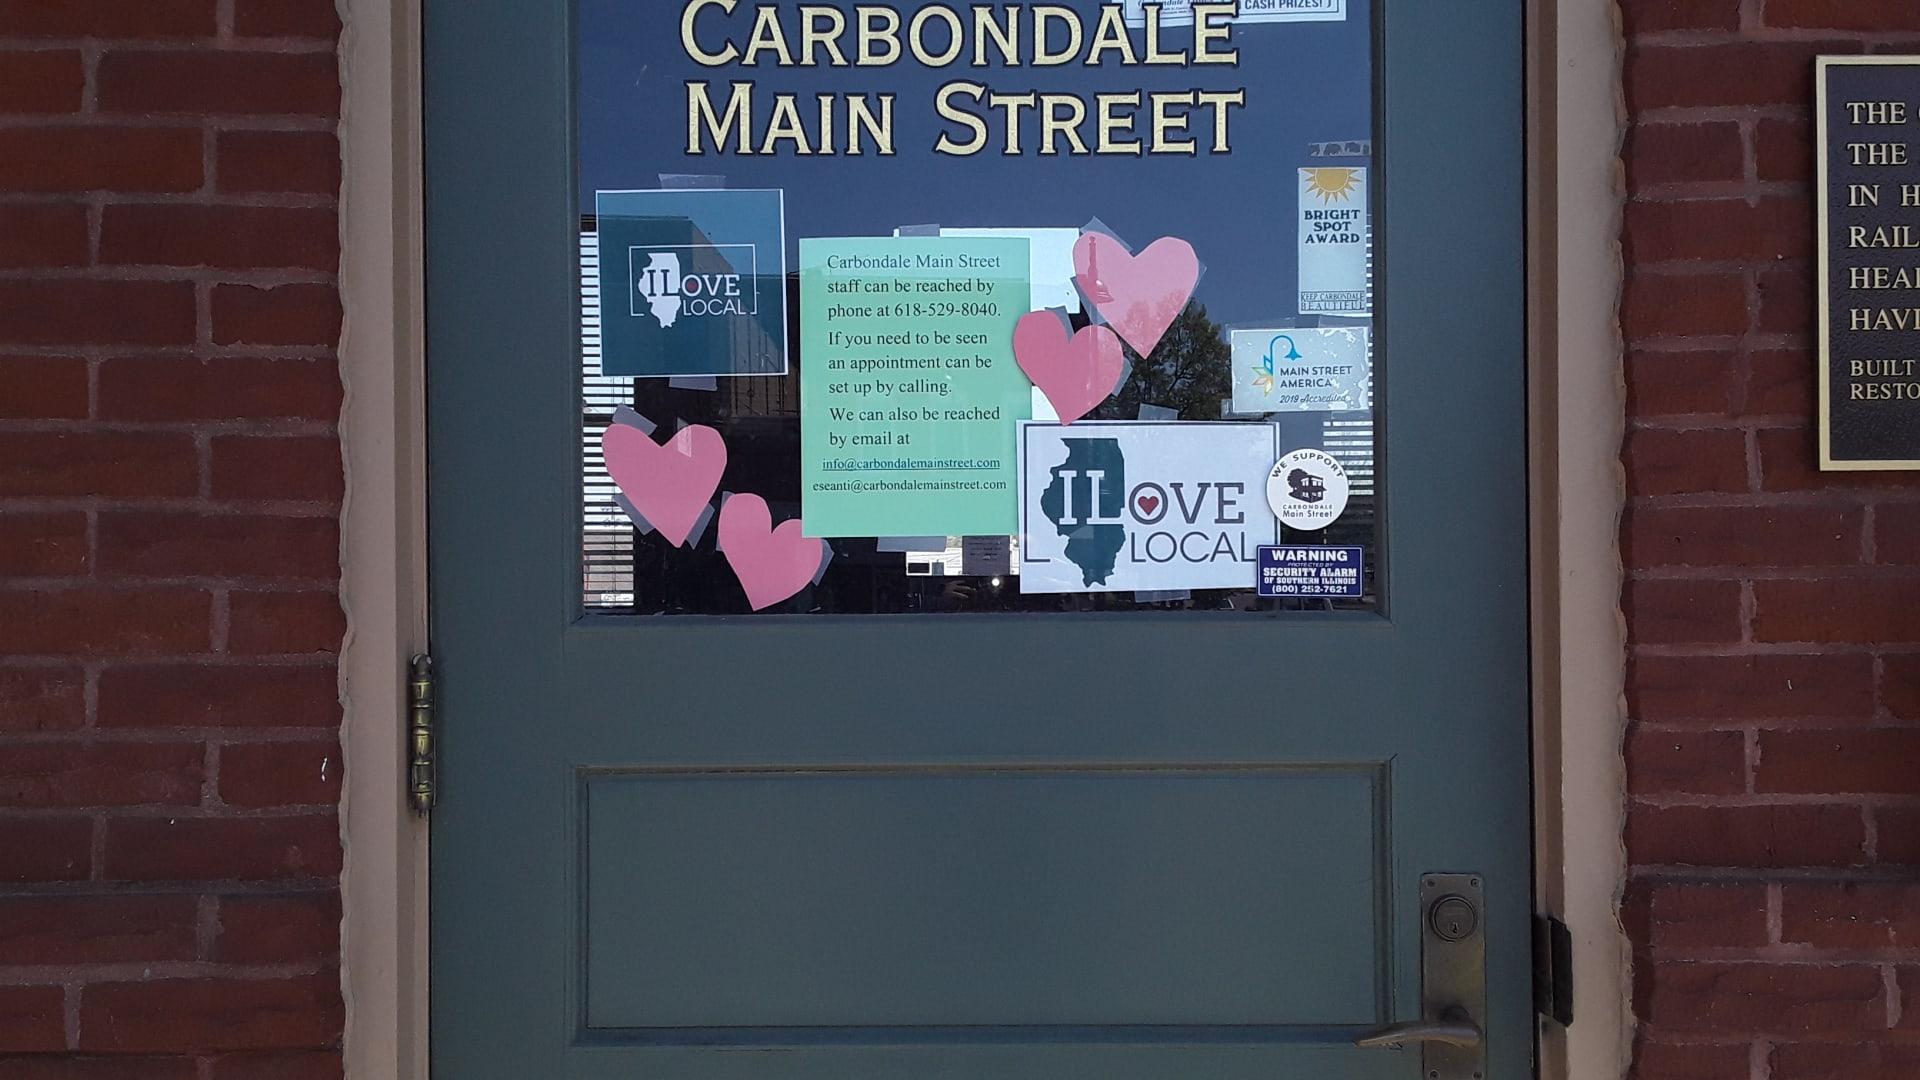 Carbondale-Main-Street-w1920.jpg